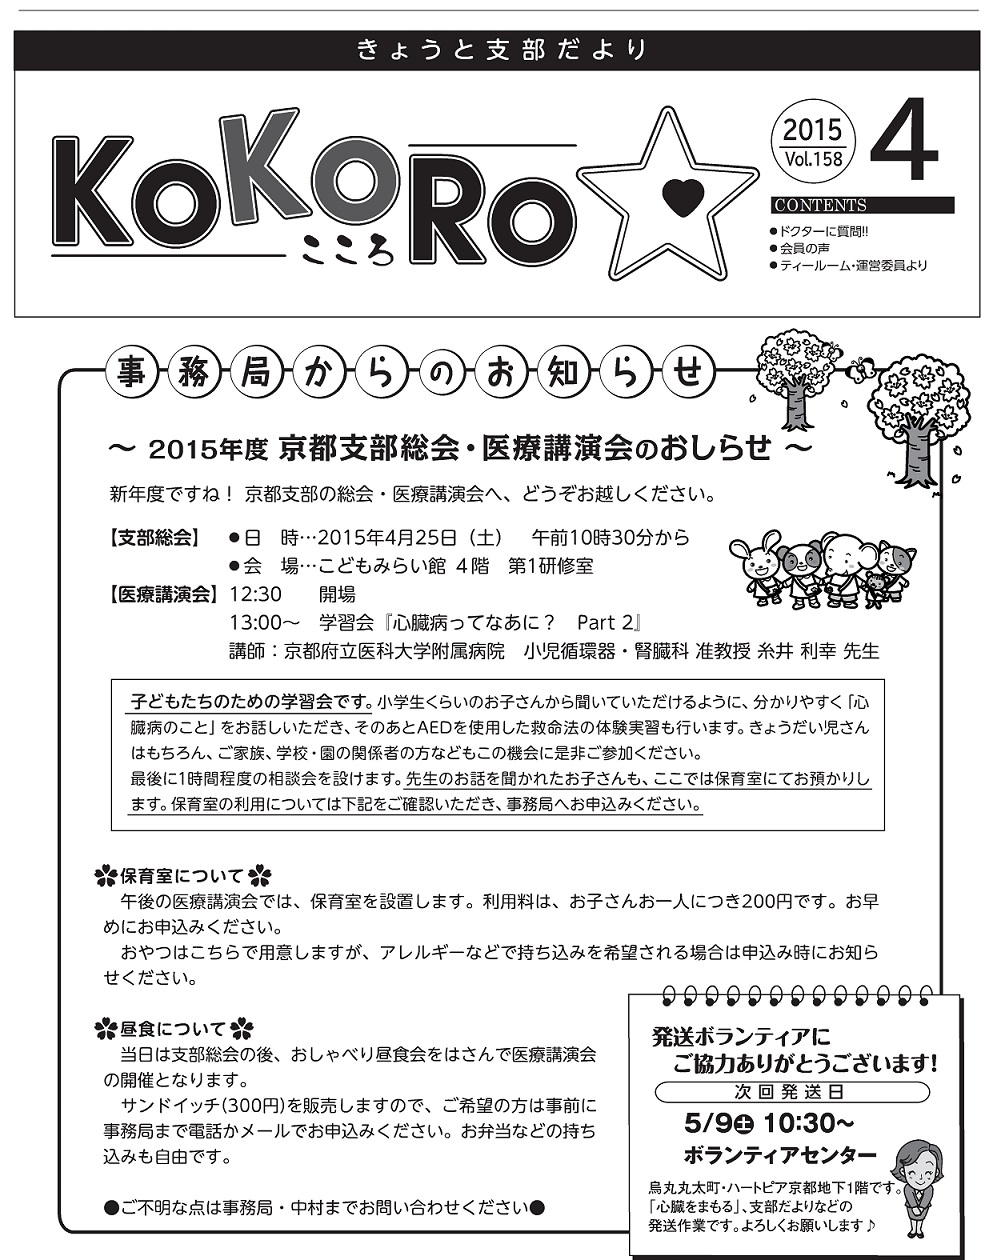 KOKORO4月号(vol.158)